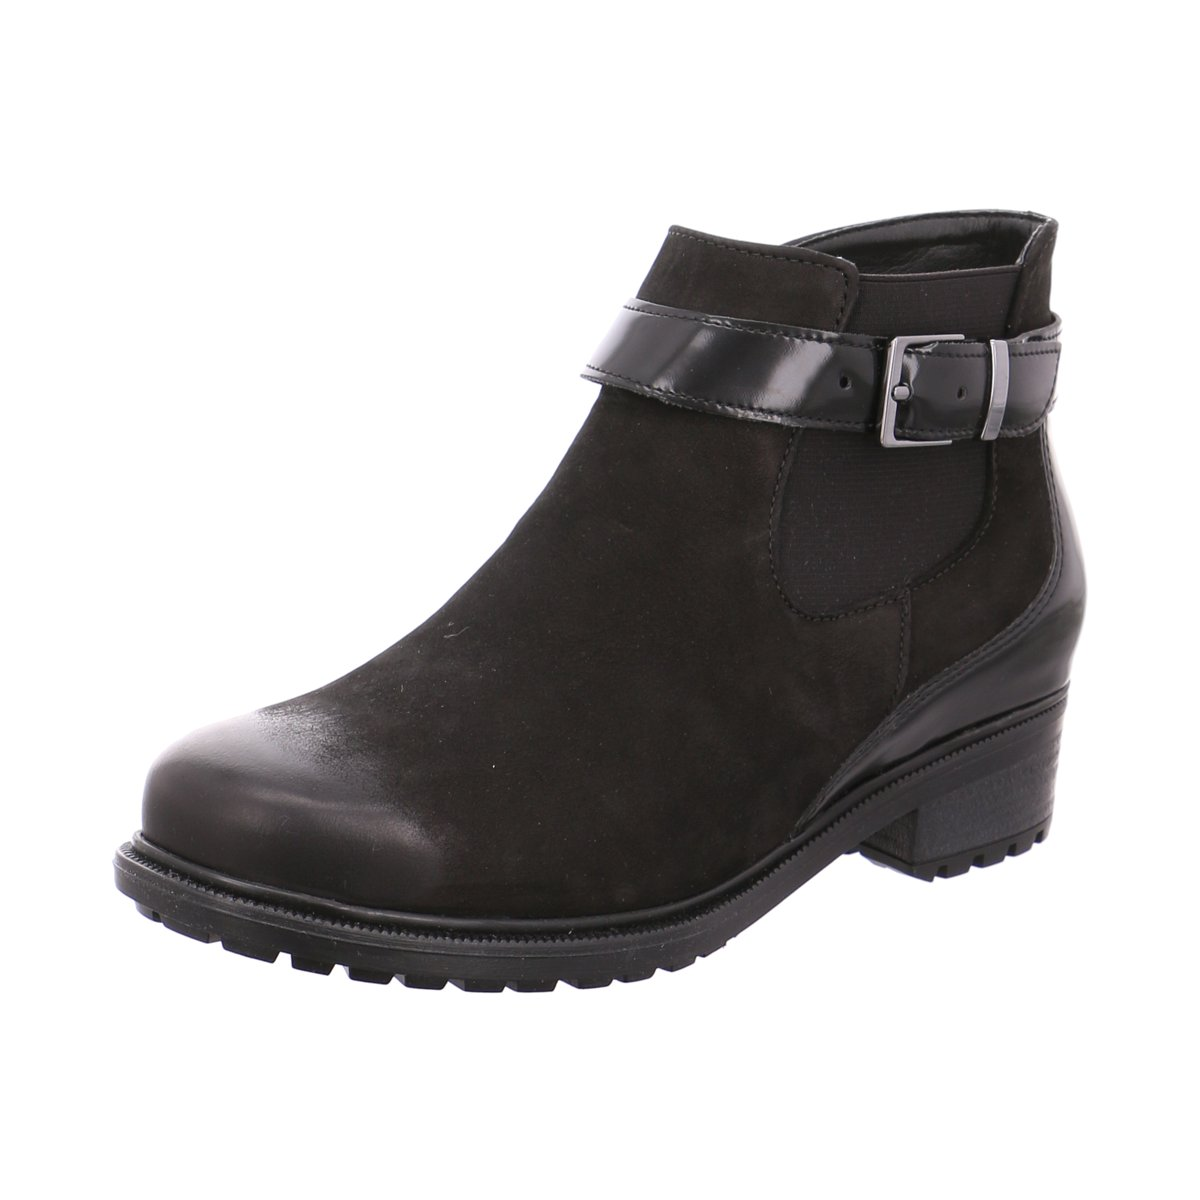 Ara Damen Stiefeletten NV 12-48816-81 schwarz 370011